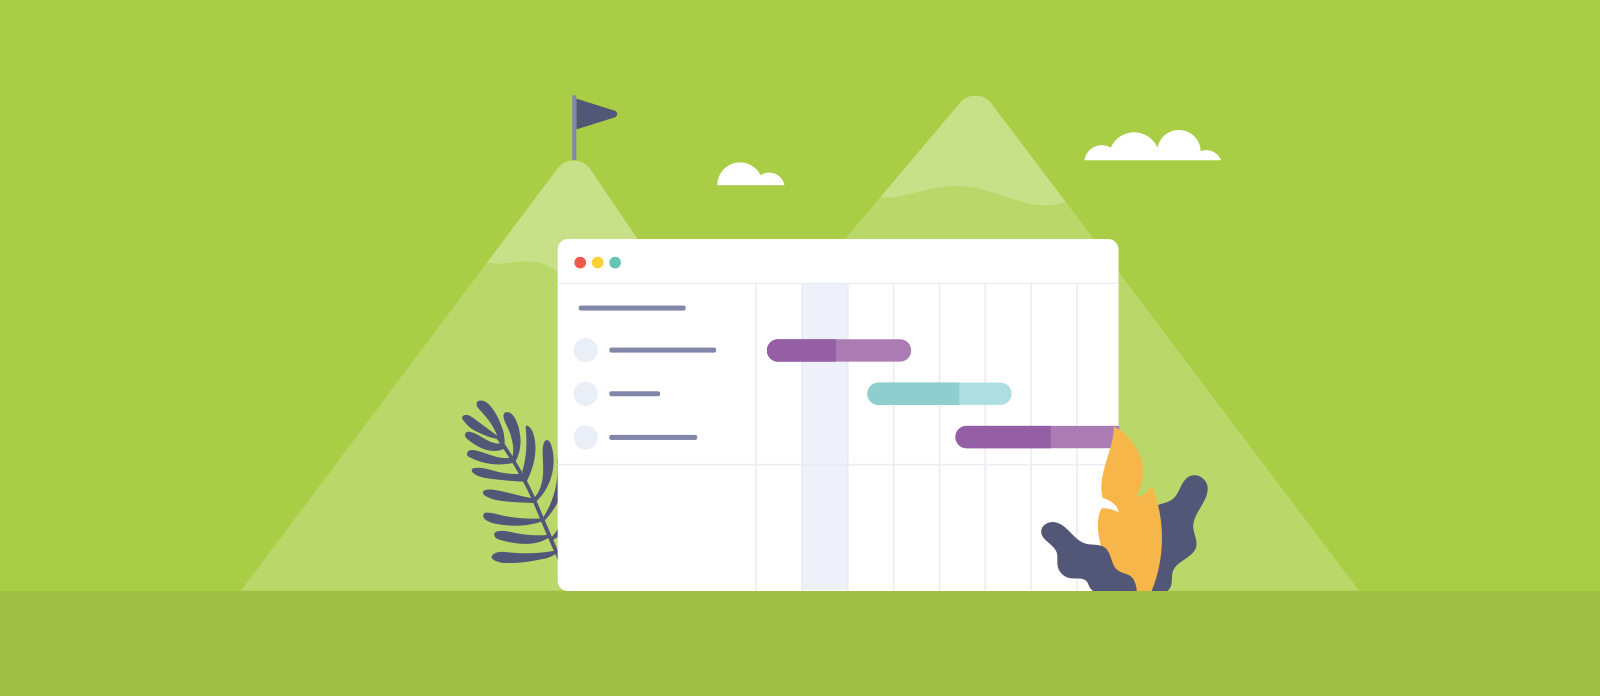 Agile Project Management Methodology With Gantt Charts Teamgantt